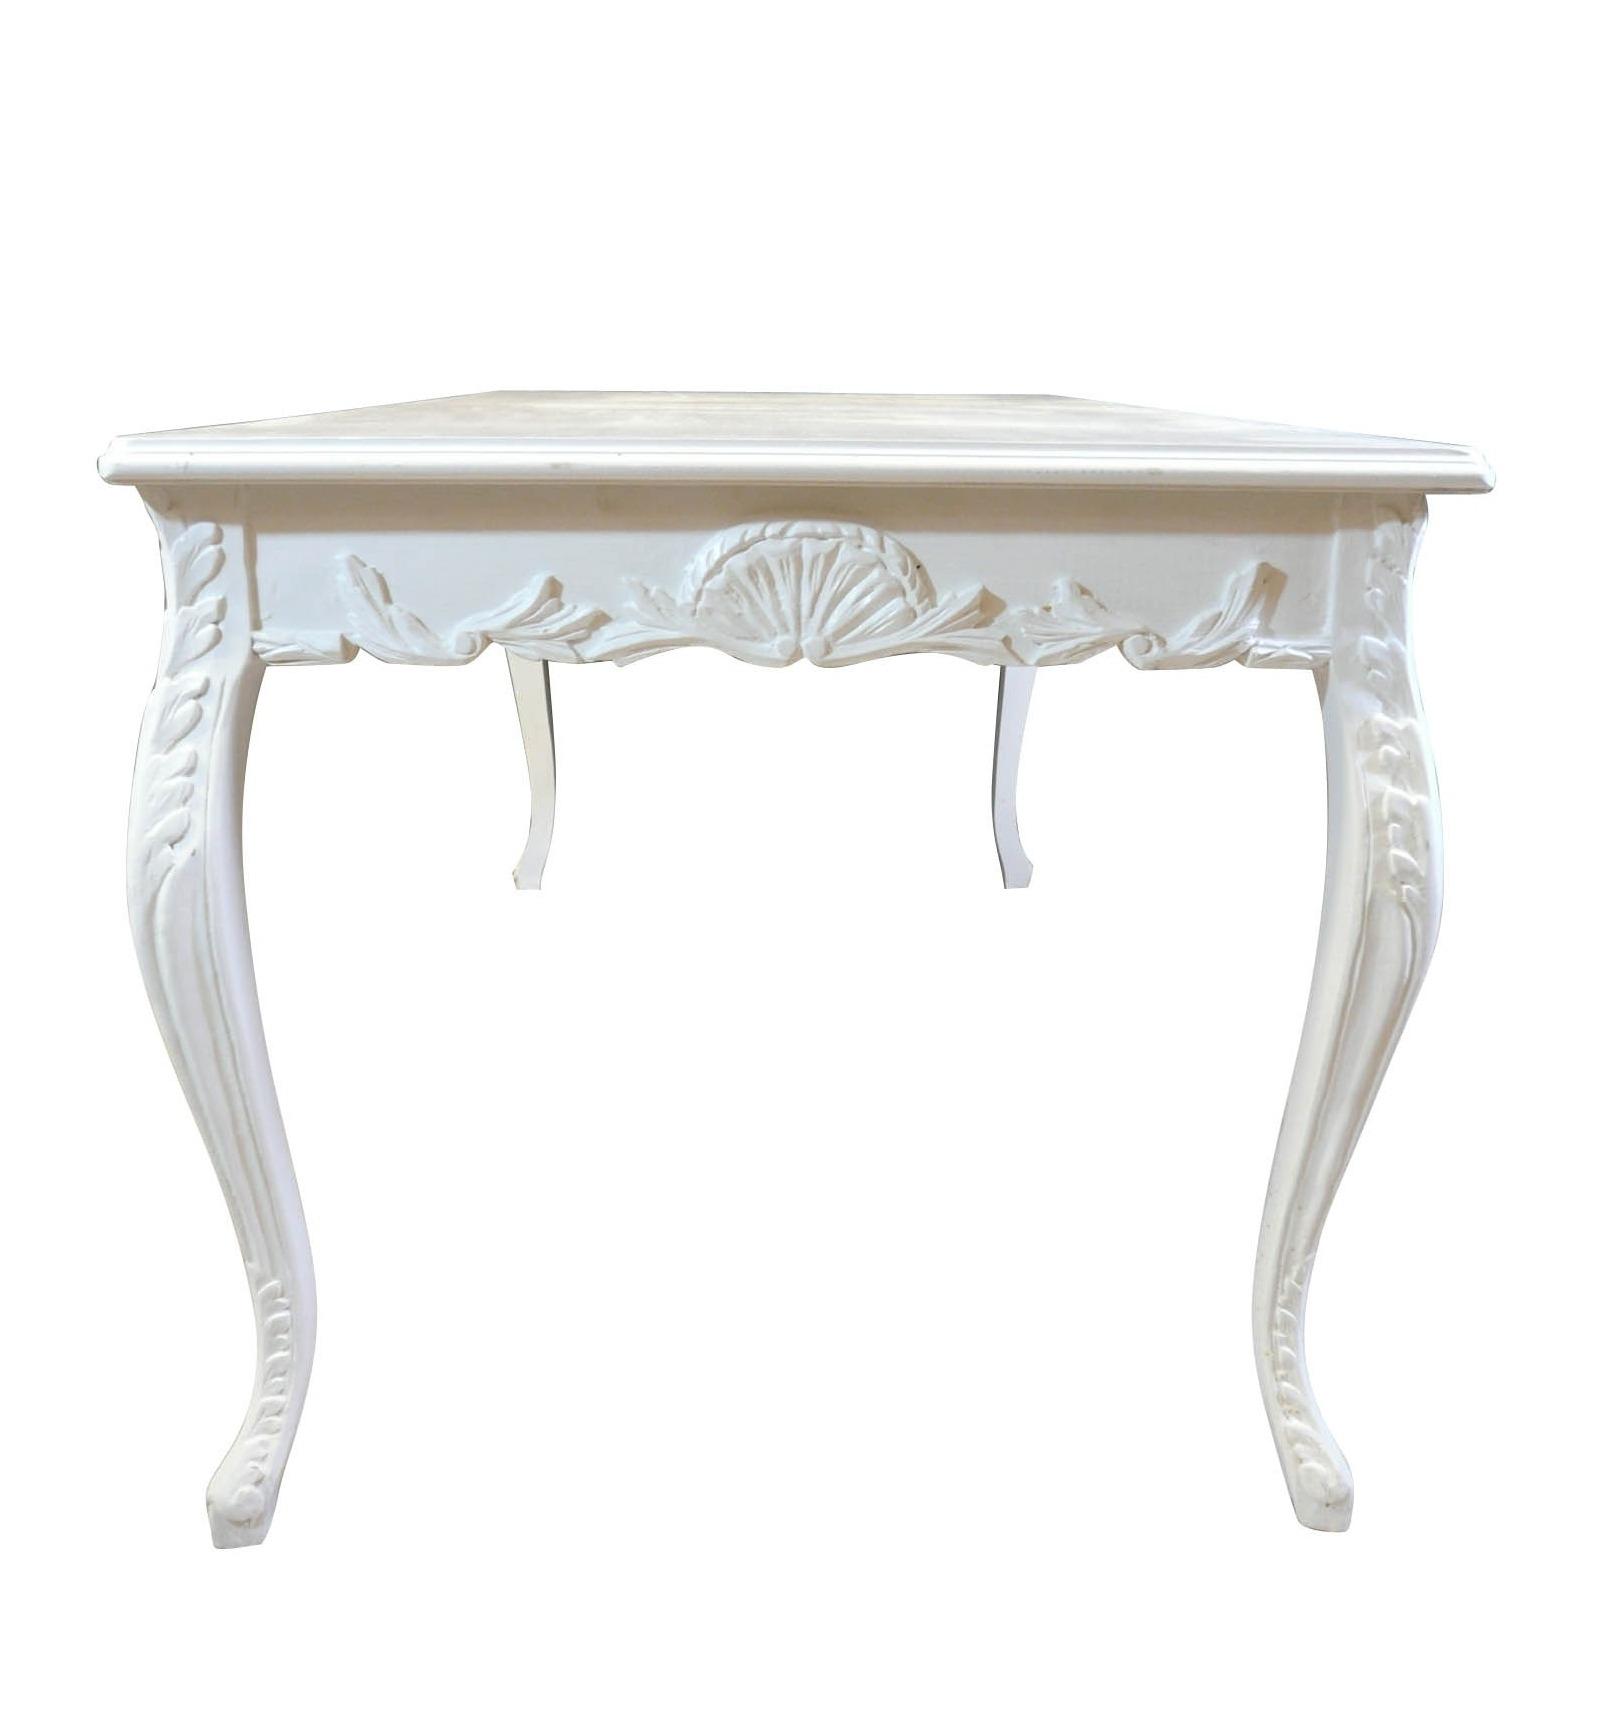 Table baroque blanche de salle manger pour 8 personnes - Table de chevet baroque blanche ...